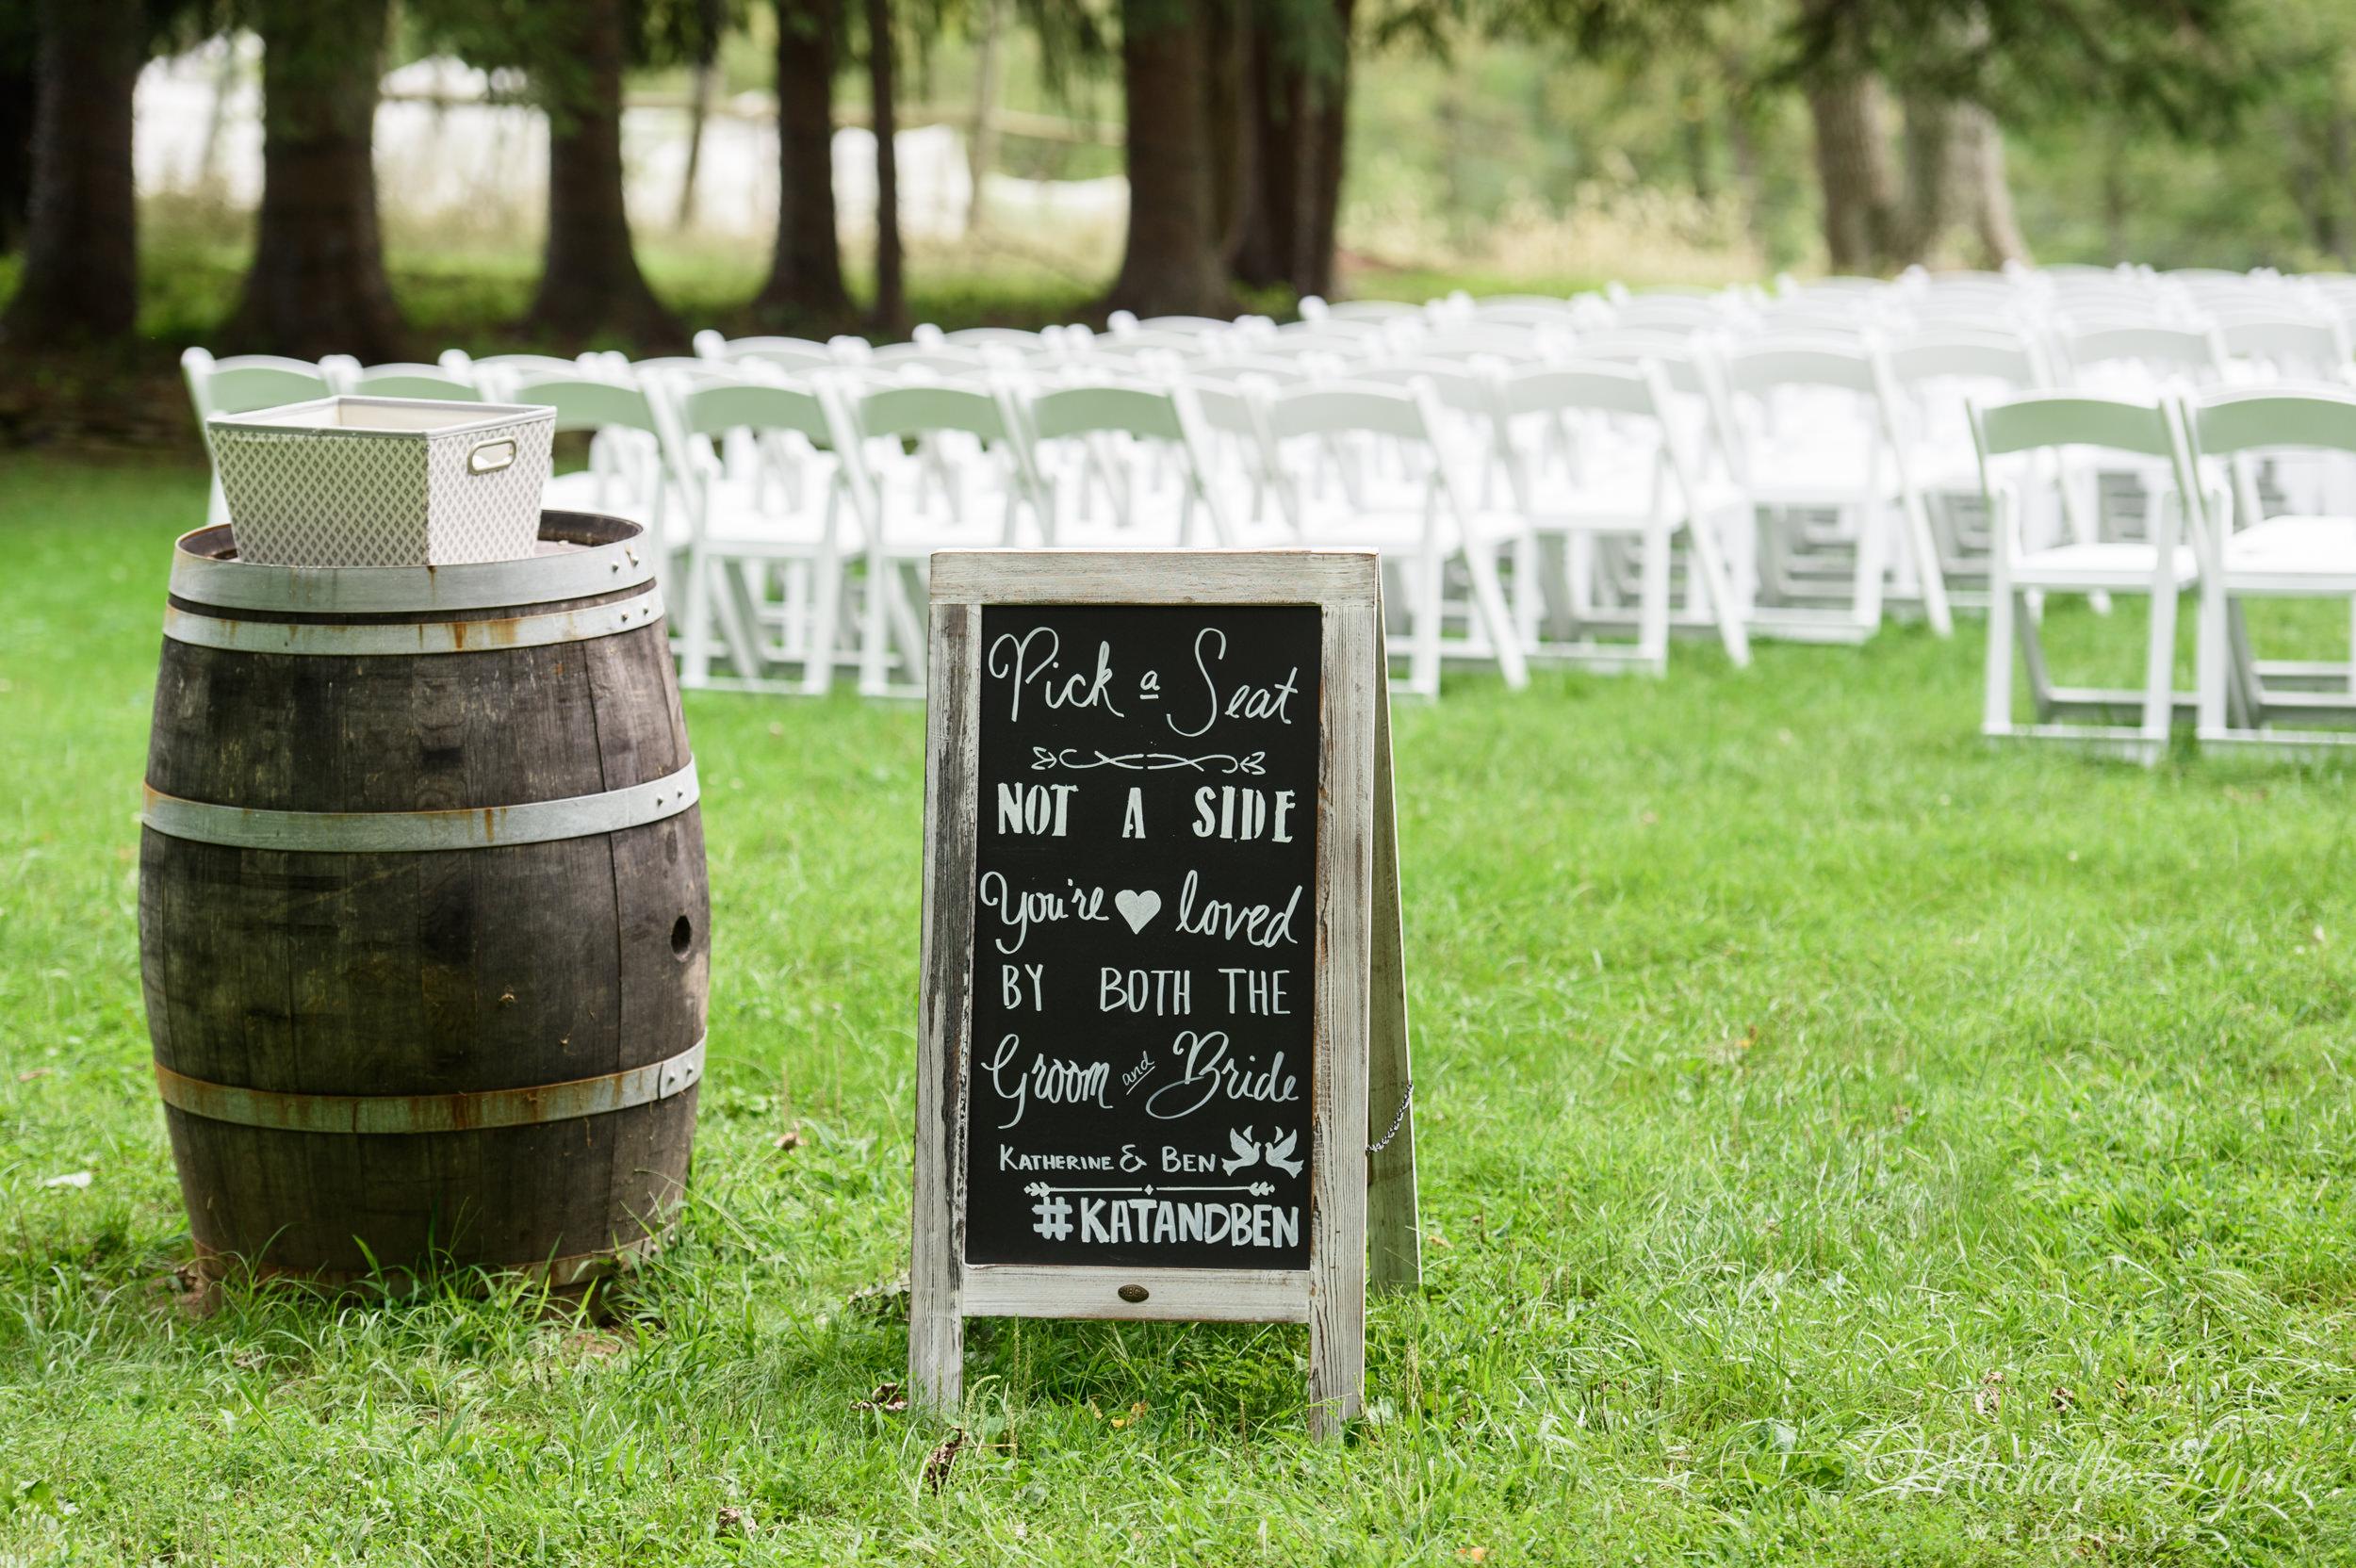 mlw-unionville-vineyards-nj-wedding-photography-28.jpg